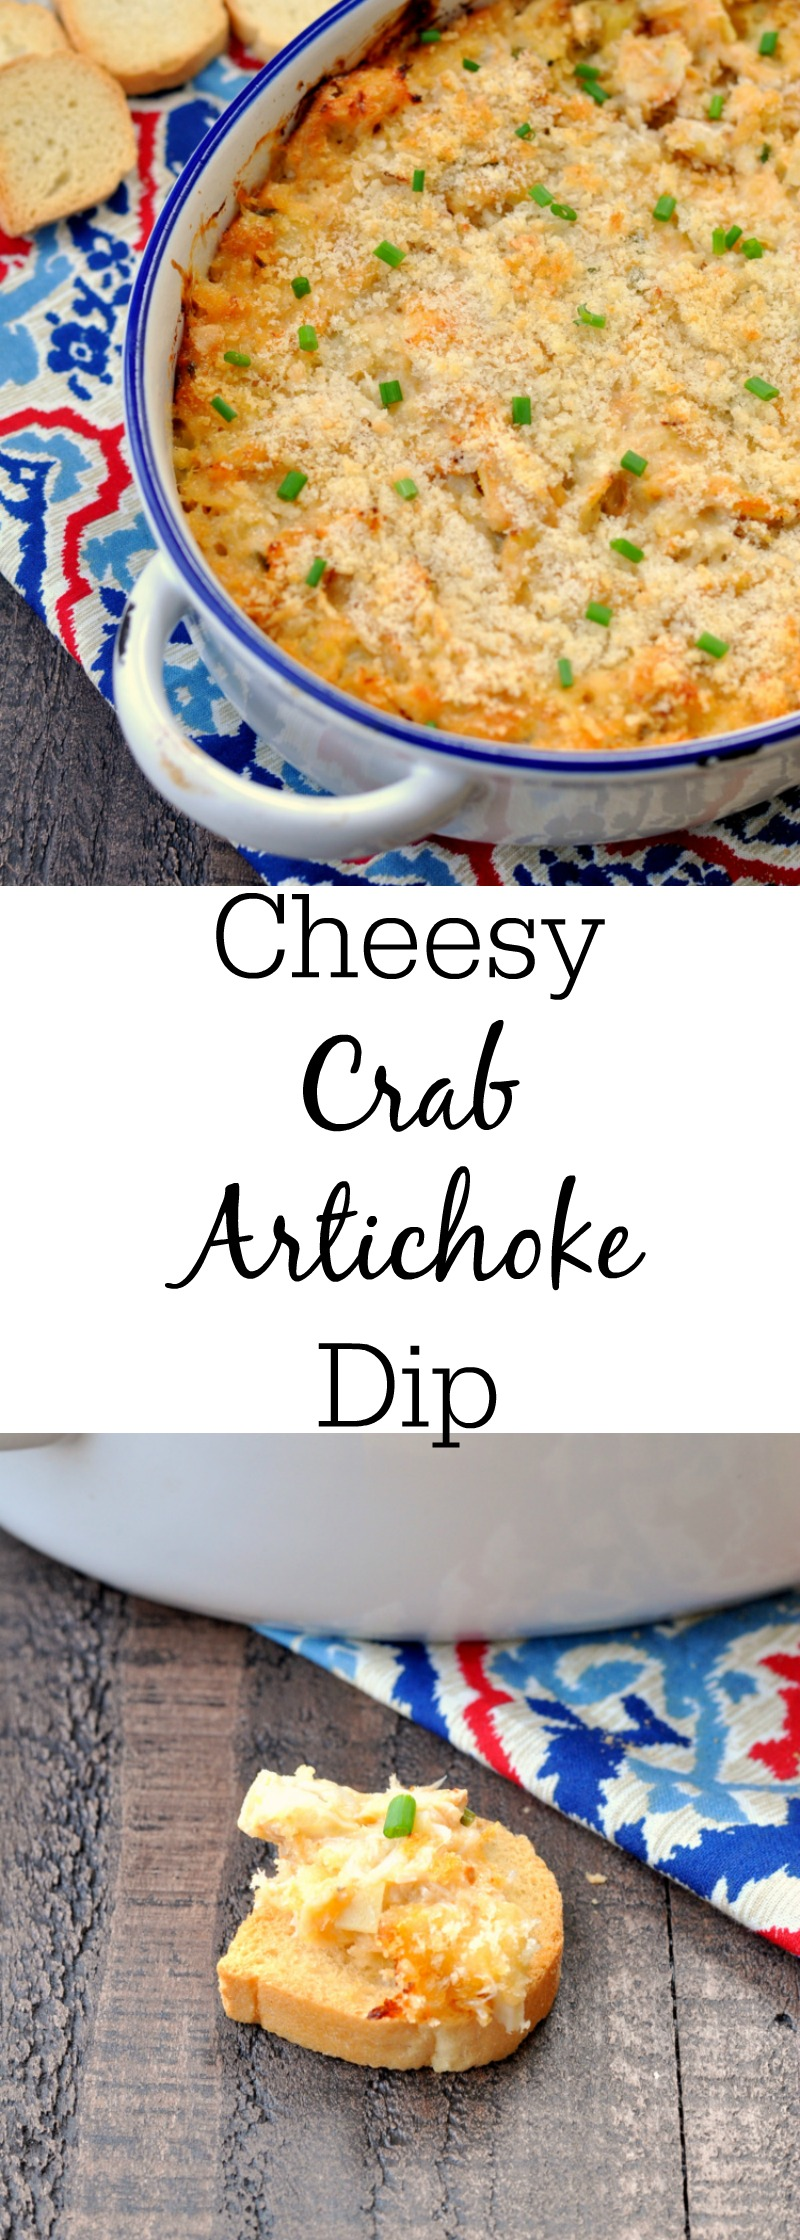 Cheesy Crab Artichoke Dip